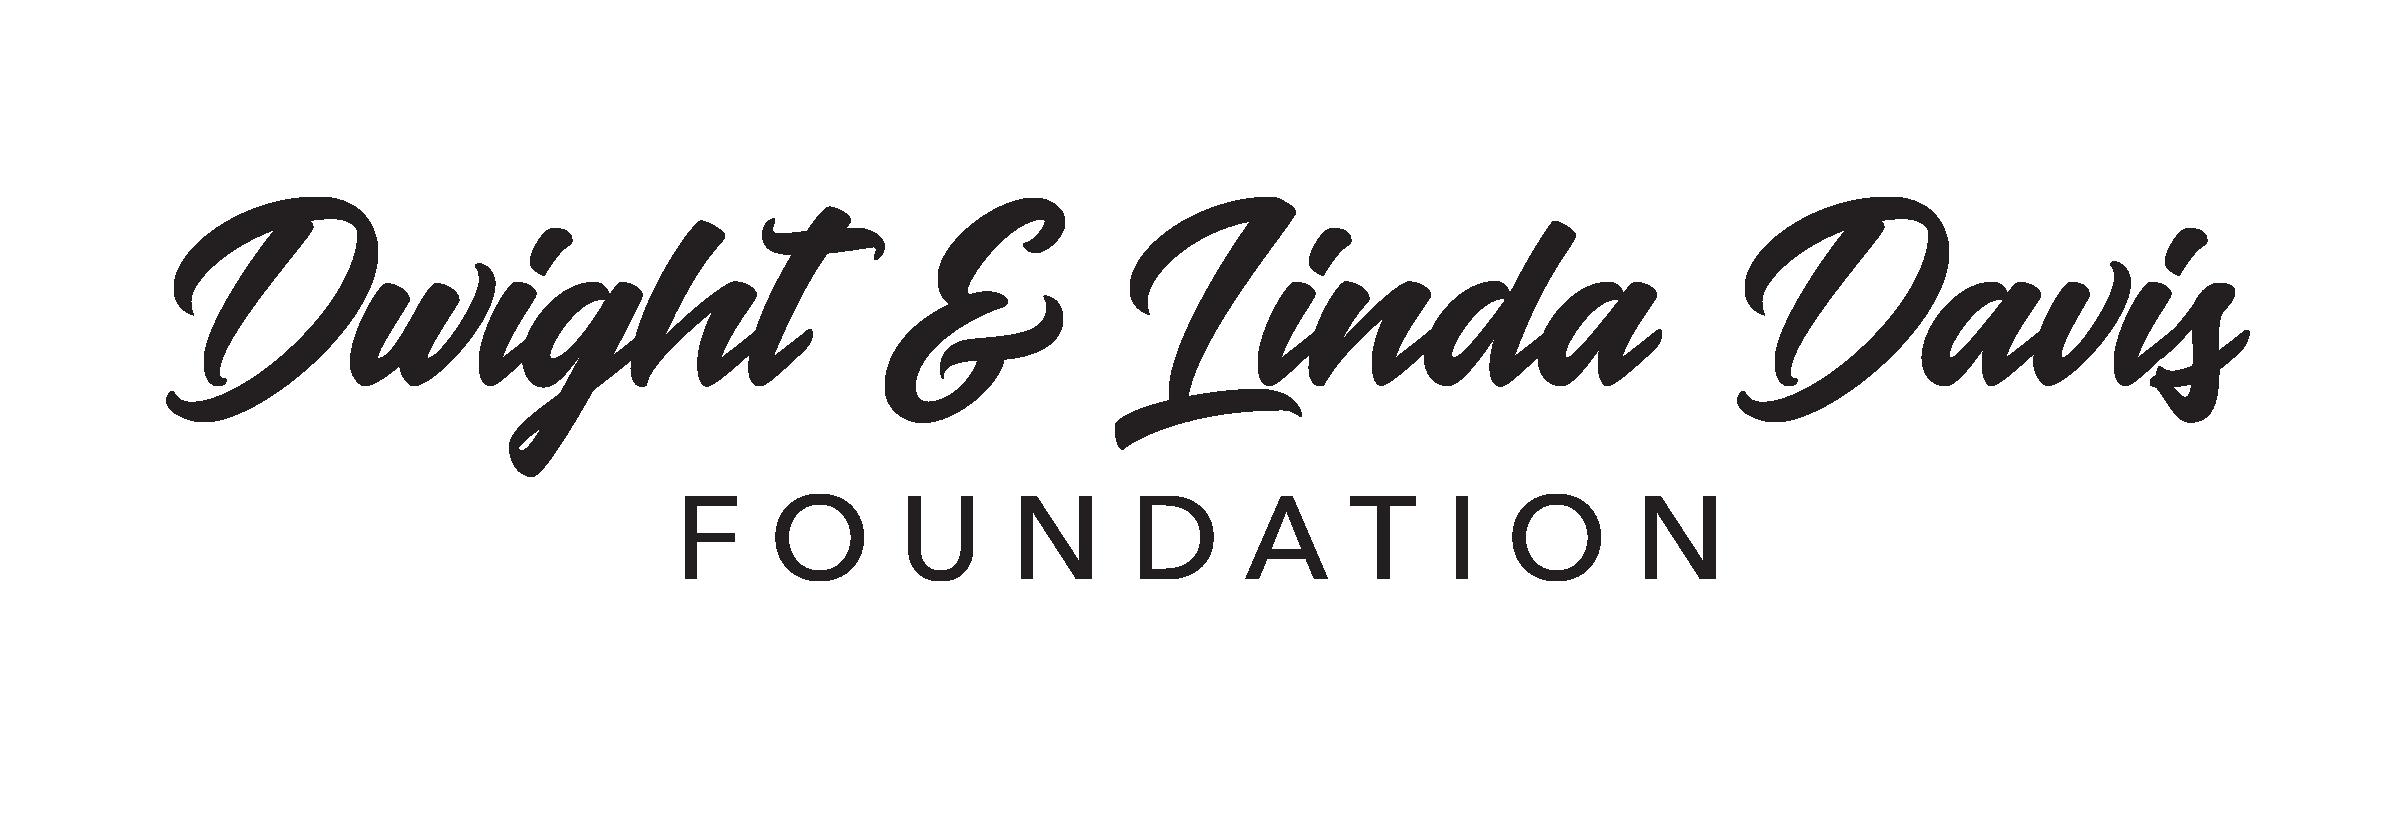 Dwight & Linda Davis Foundation Logo